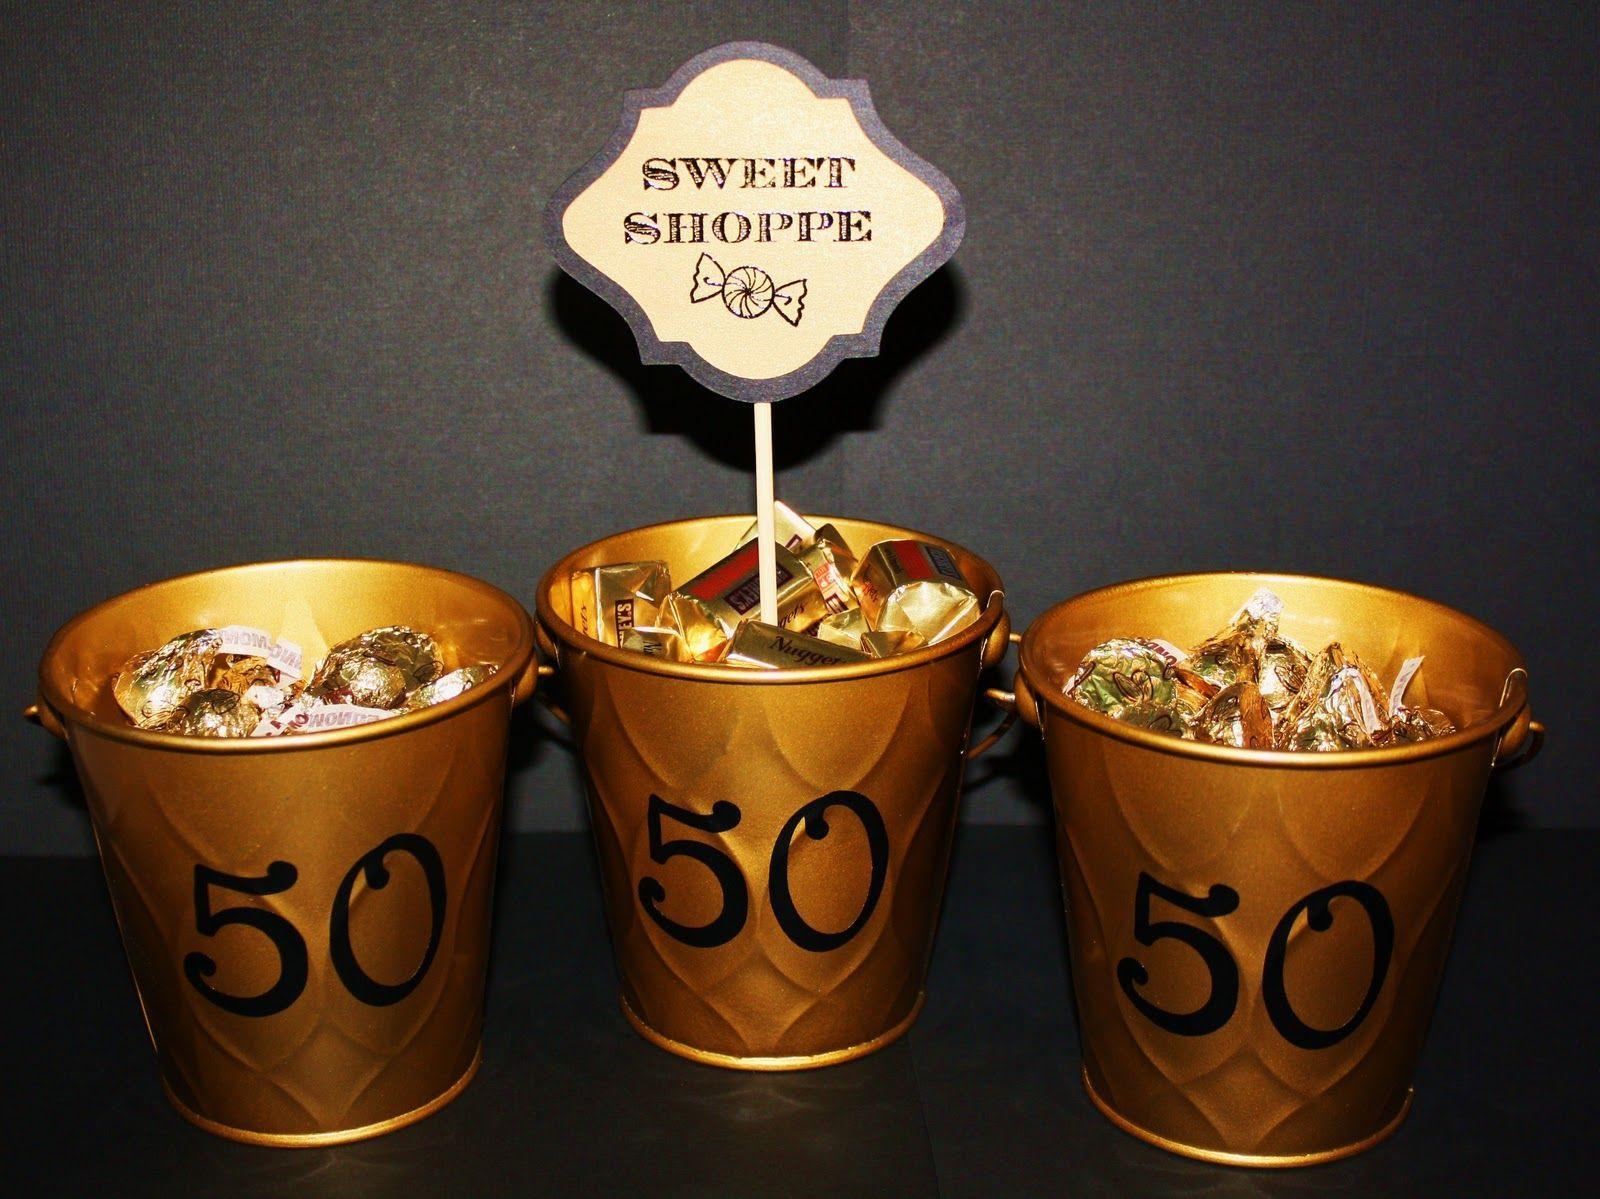 Hoo's My Valentine? 50th wedding anniversary decorations